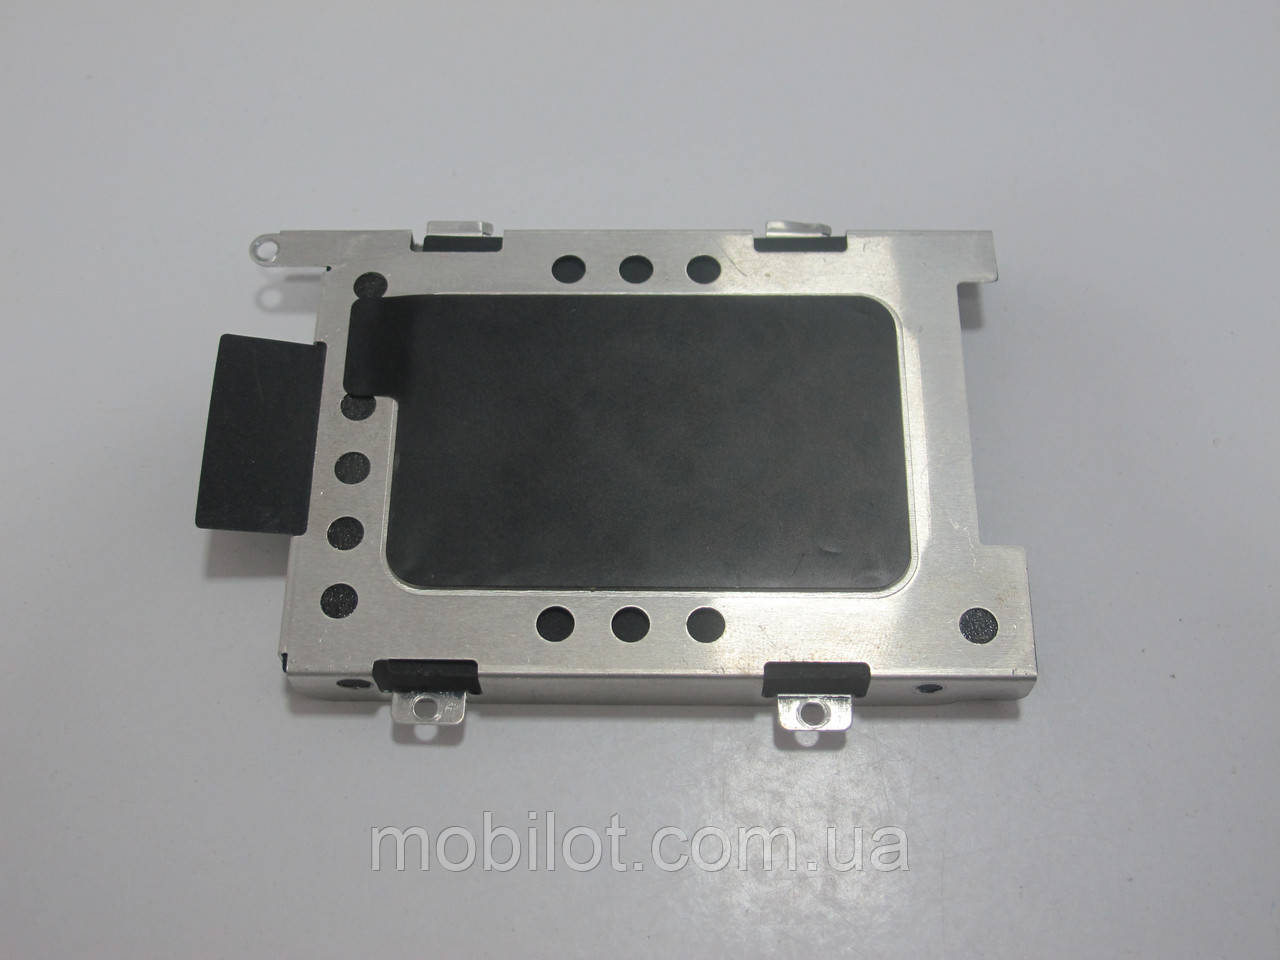 Корпус (карман, корзина, крепление) для HDD Asus N52D (NZ-5453)